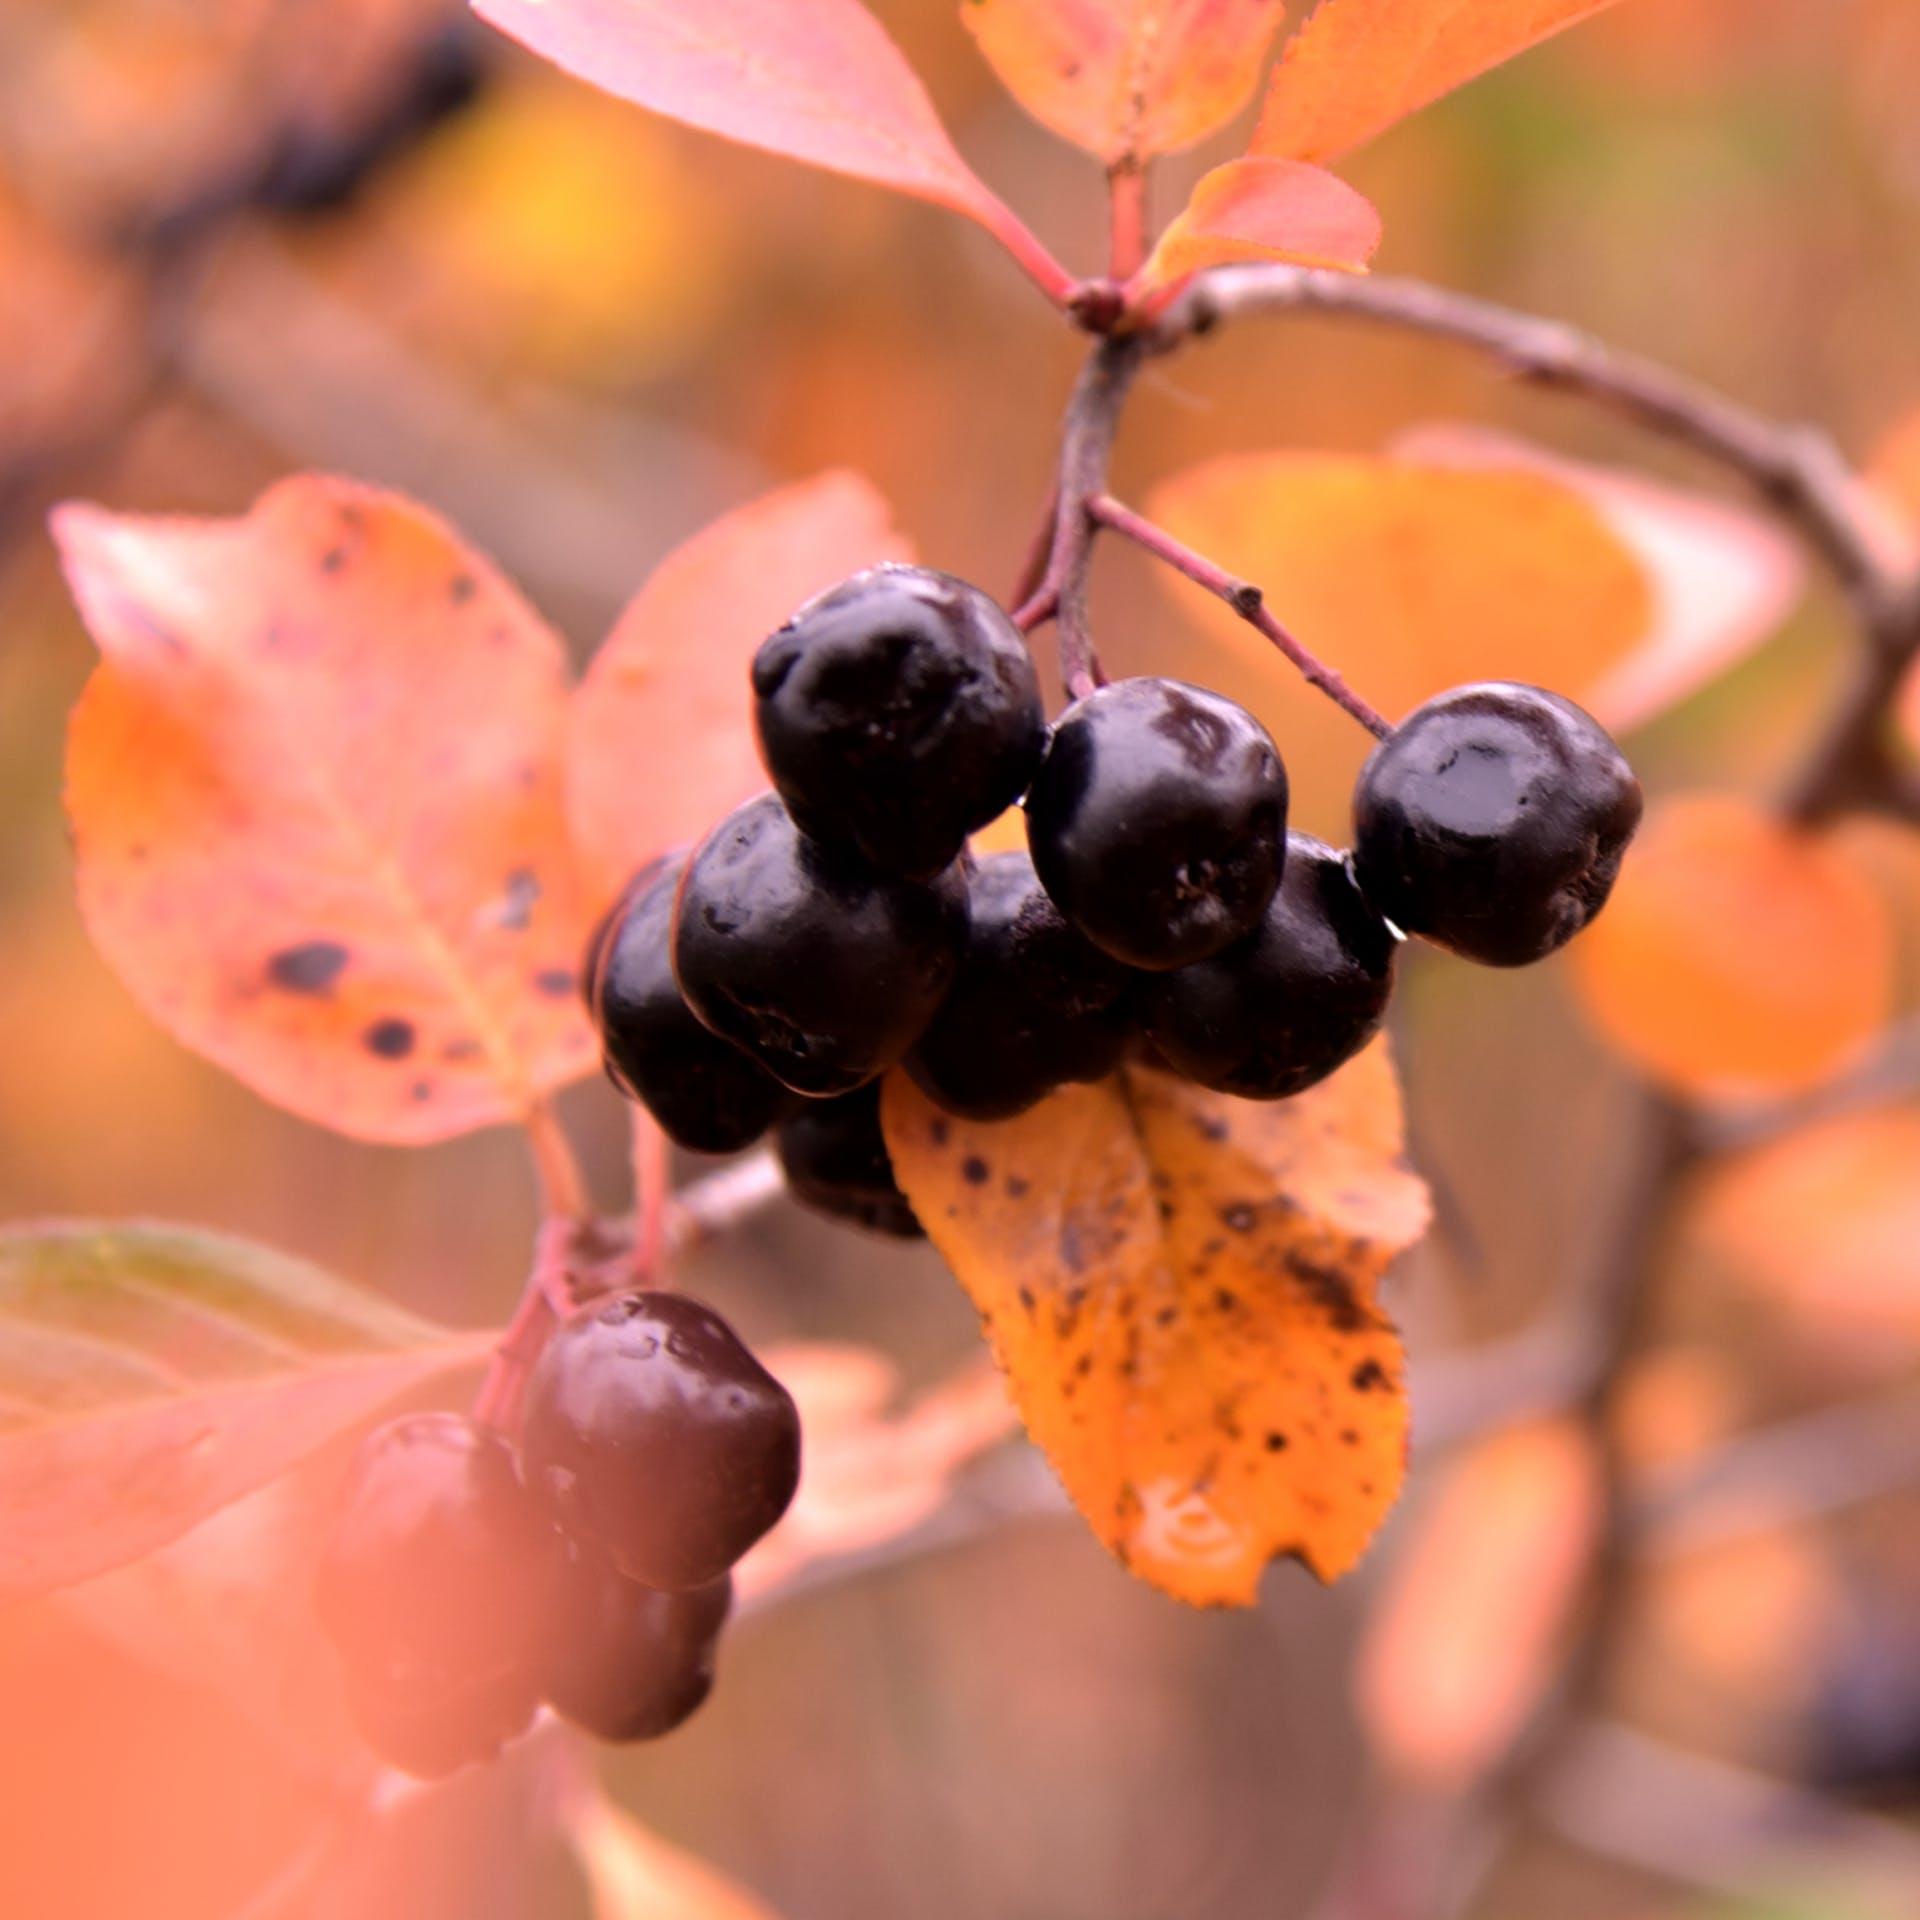 Bundle of Round Black Berrries Closeup Photo